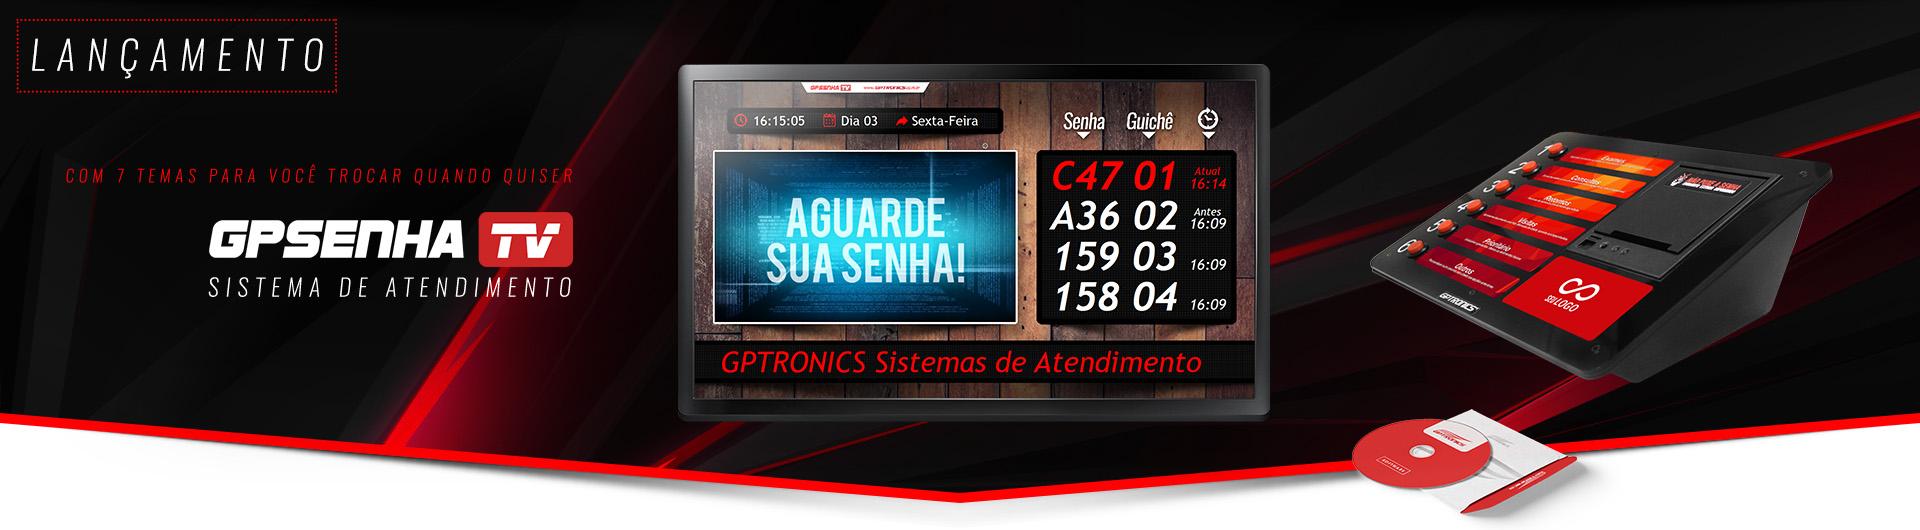 GPSenha TV